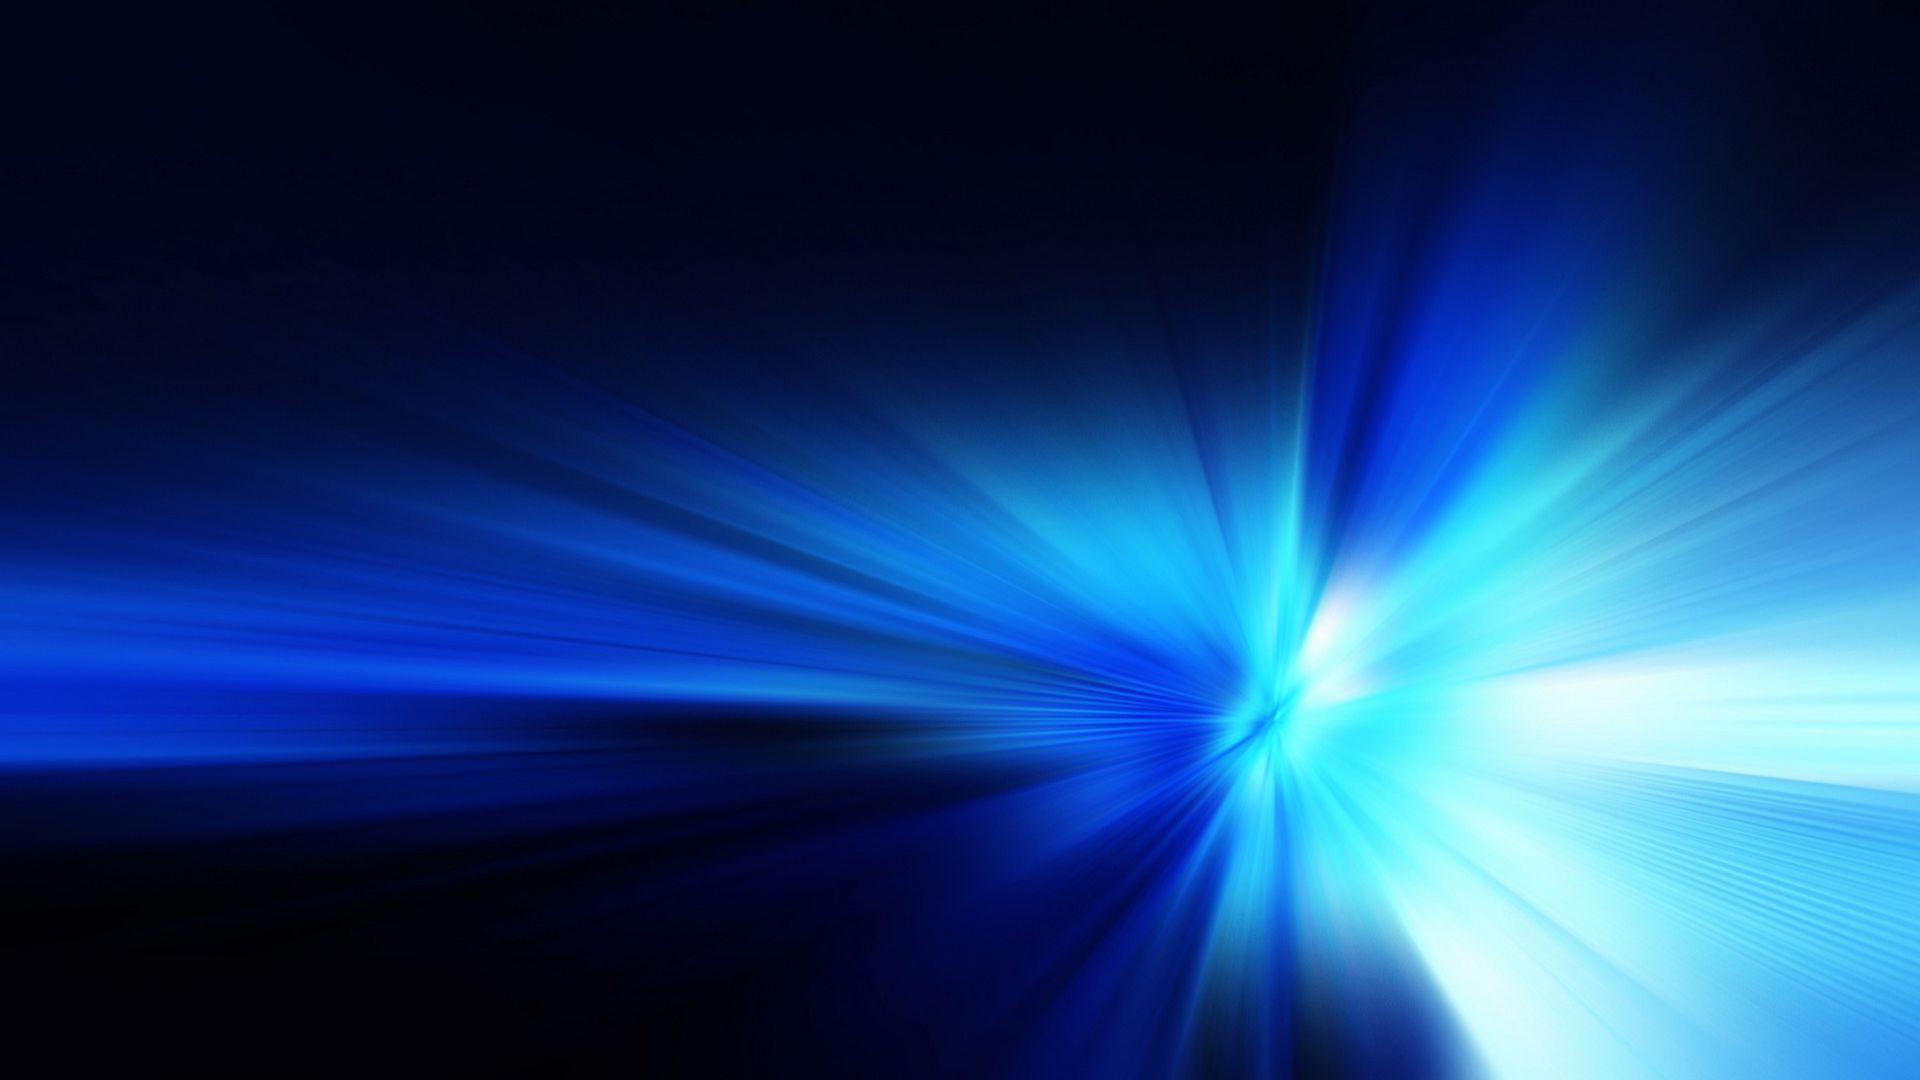 blue burst wallpaper 46419